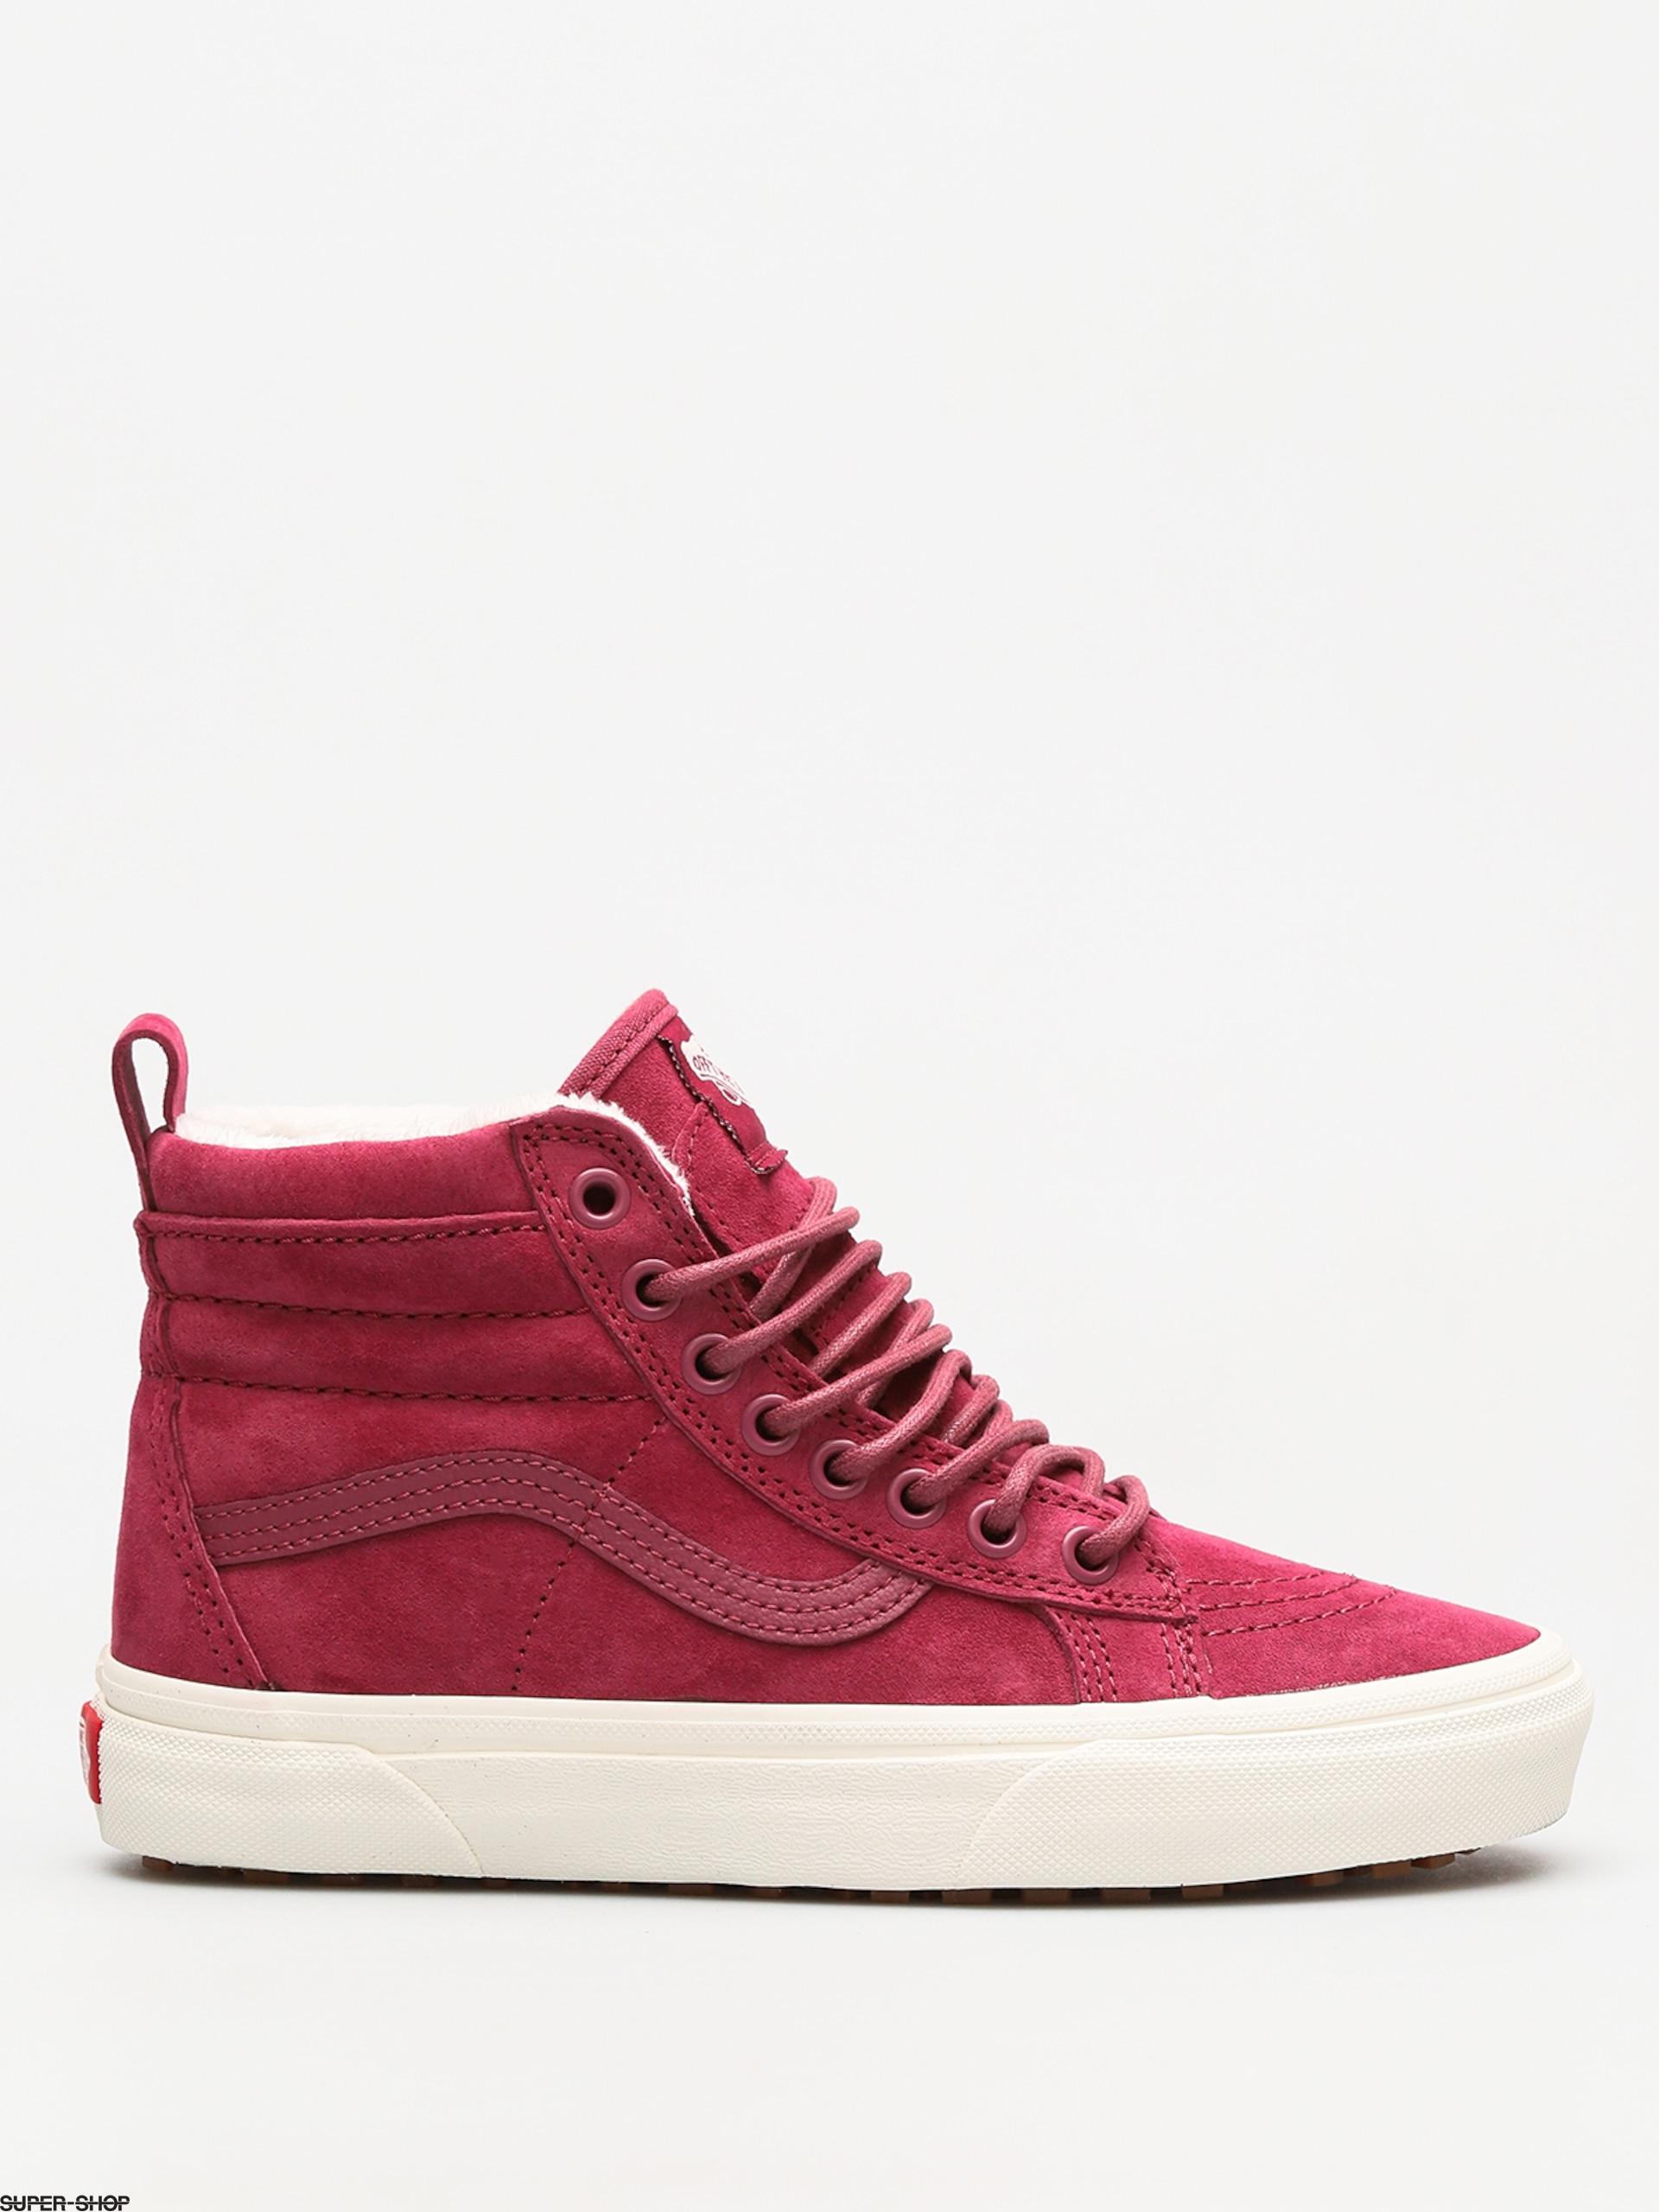 073fe7dd046 966940-w1920-vans-shoes-sk8-hi-mte-dry-rose-marshmallow.jpg